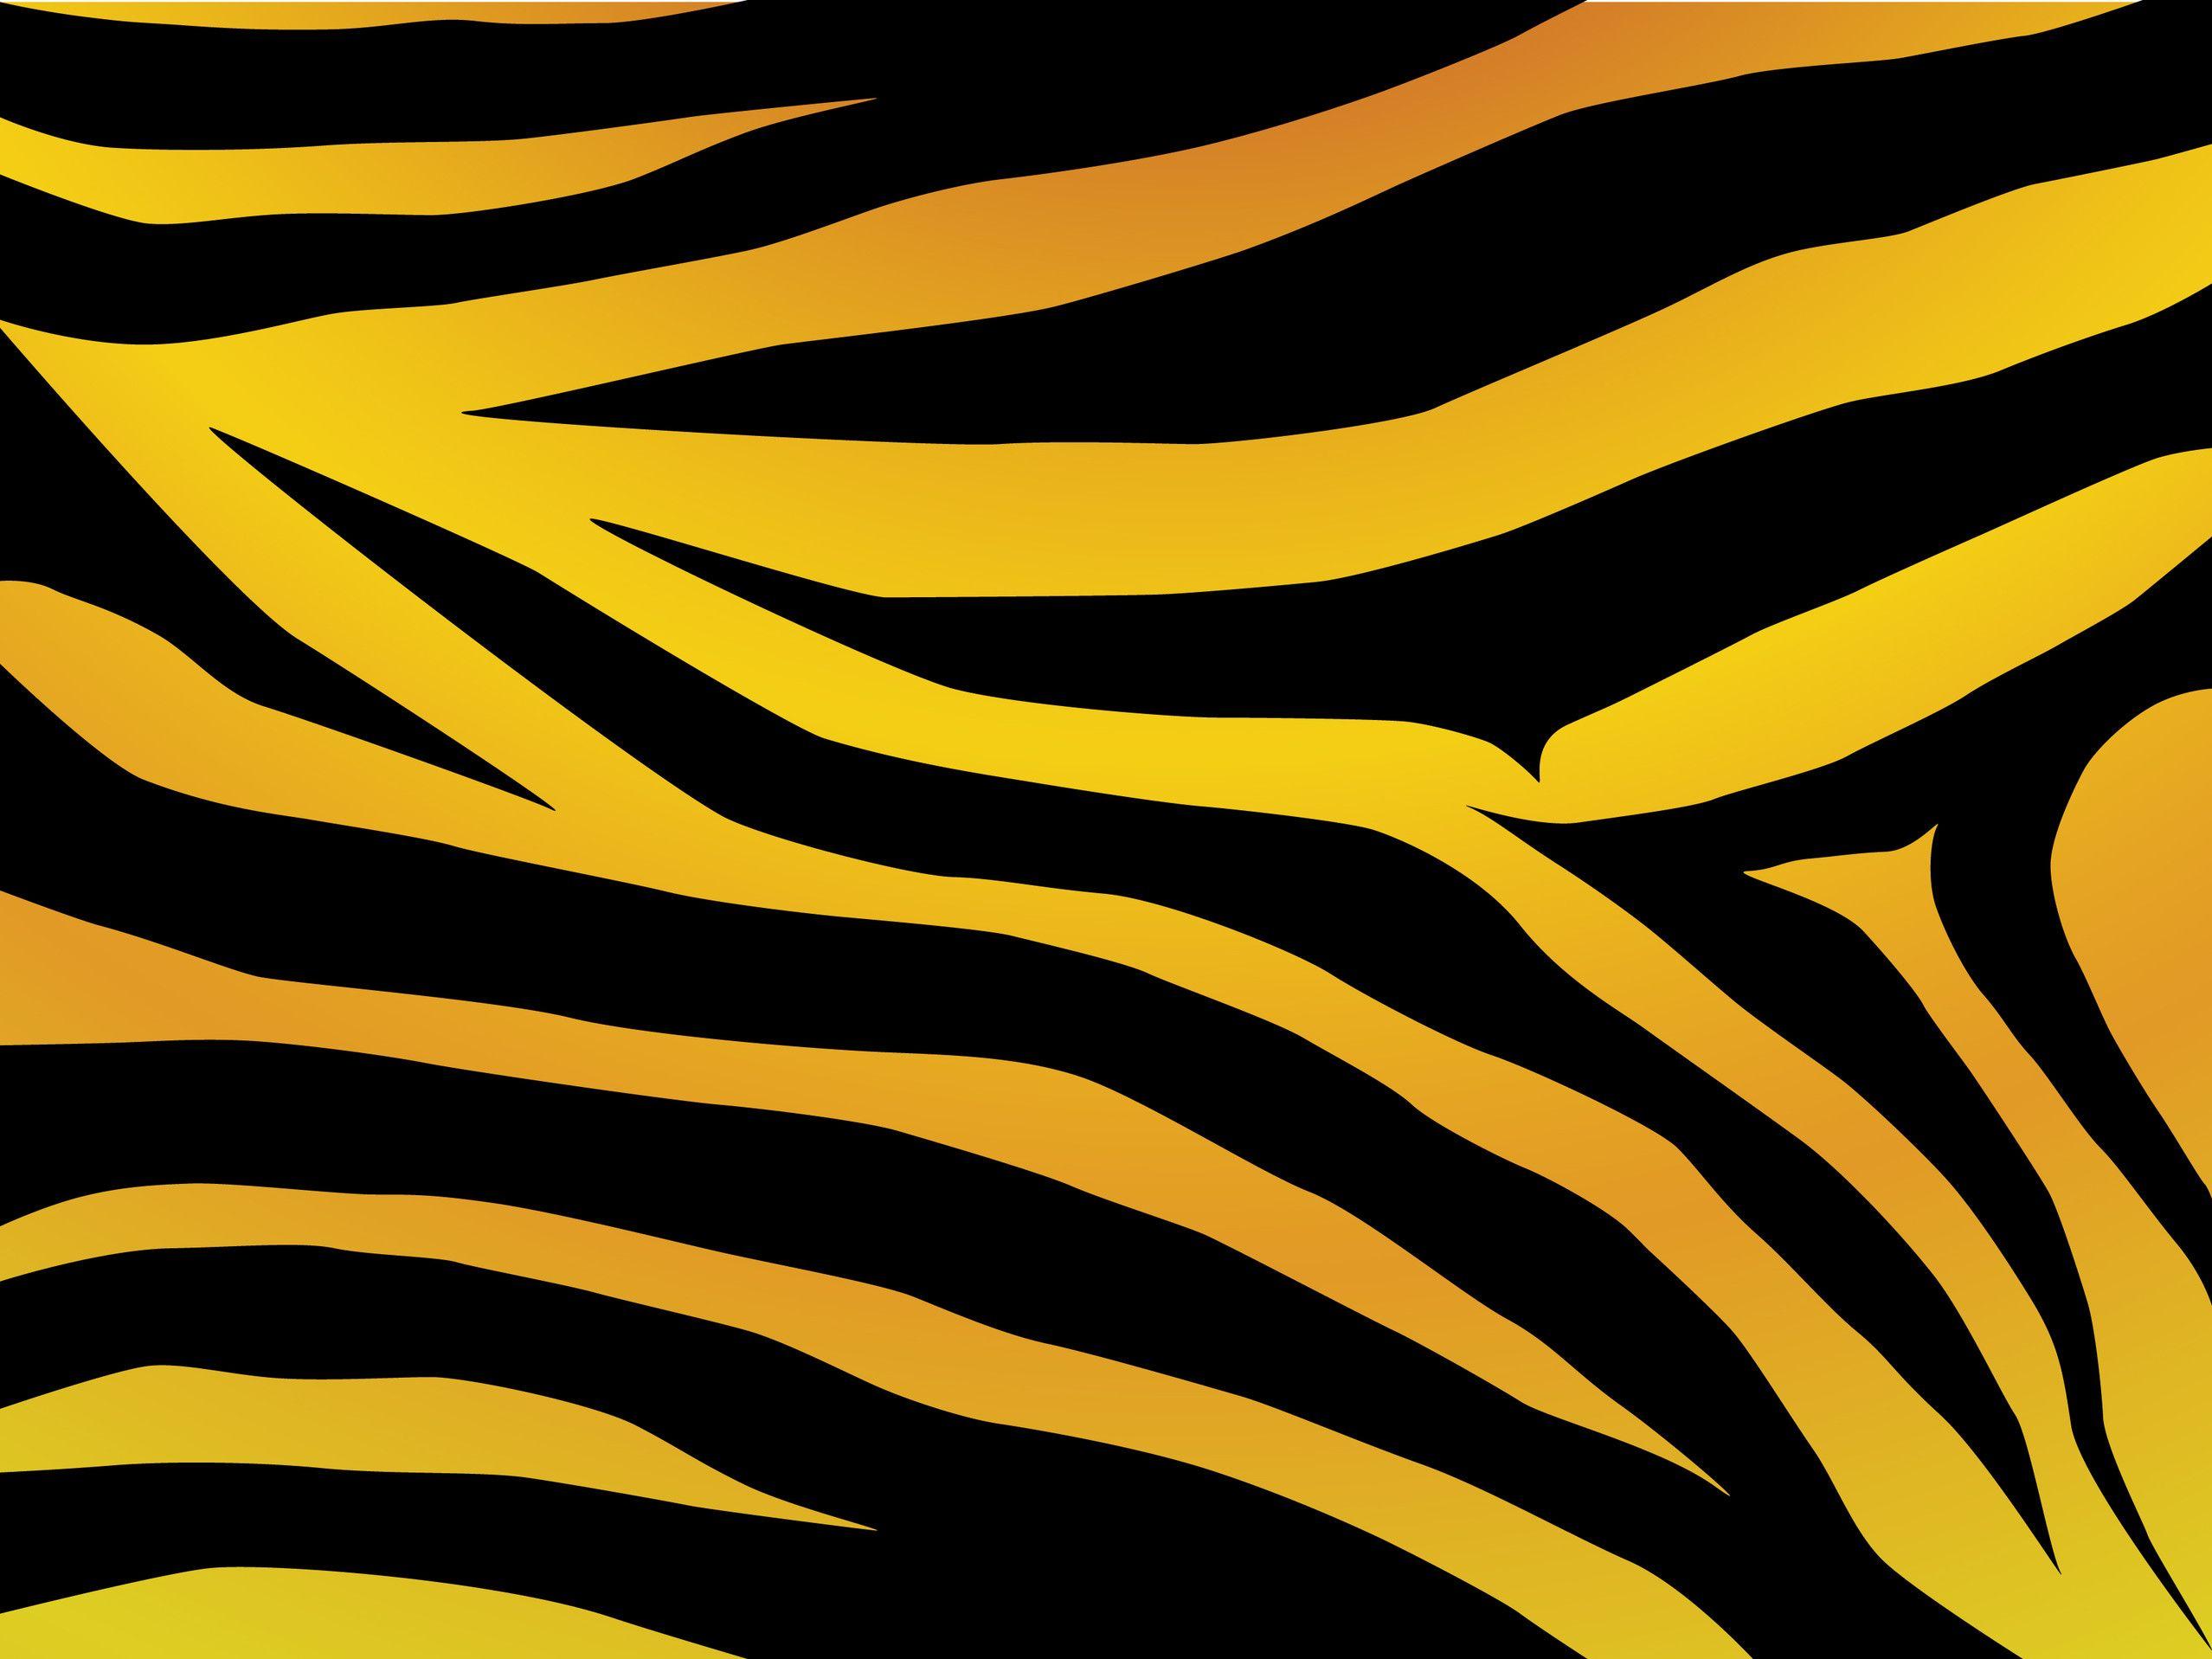 Tiger Striped Seat Protectors Or Stripes Added To Sides Zebra Print Wallpaper Zebra Print Background Animal Print Wallpaper